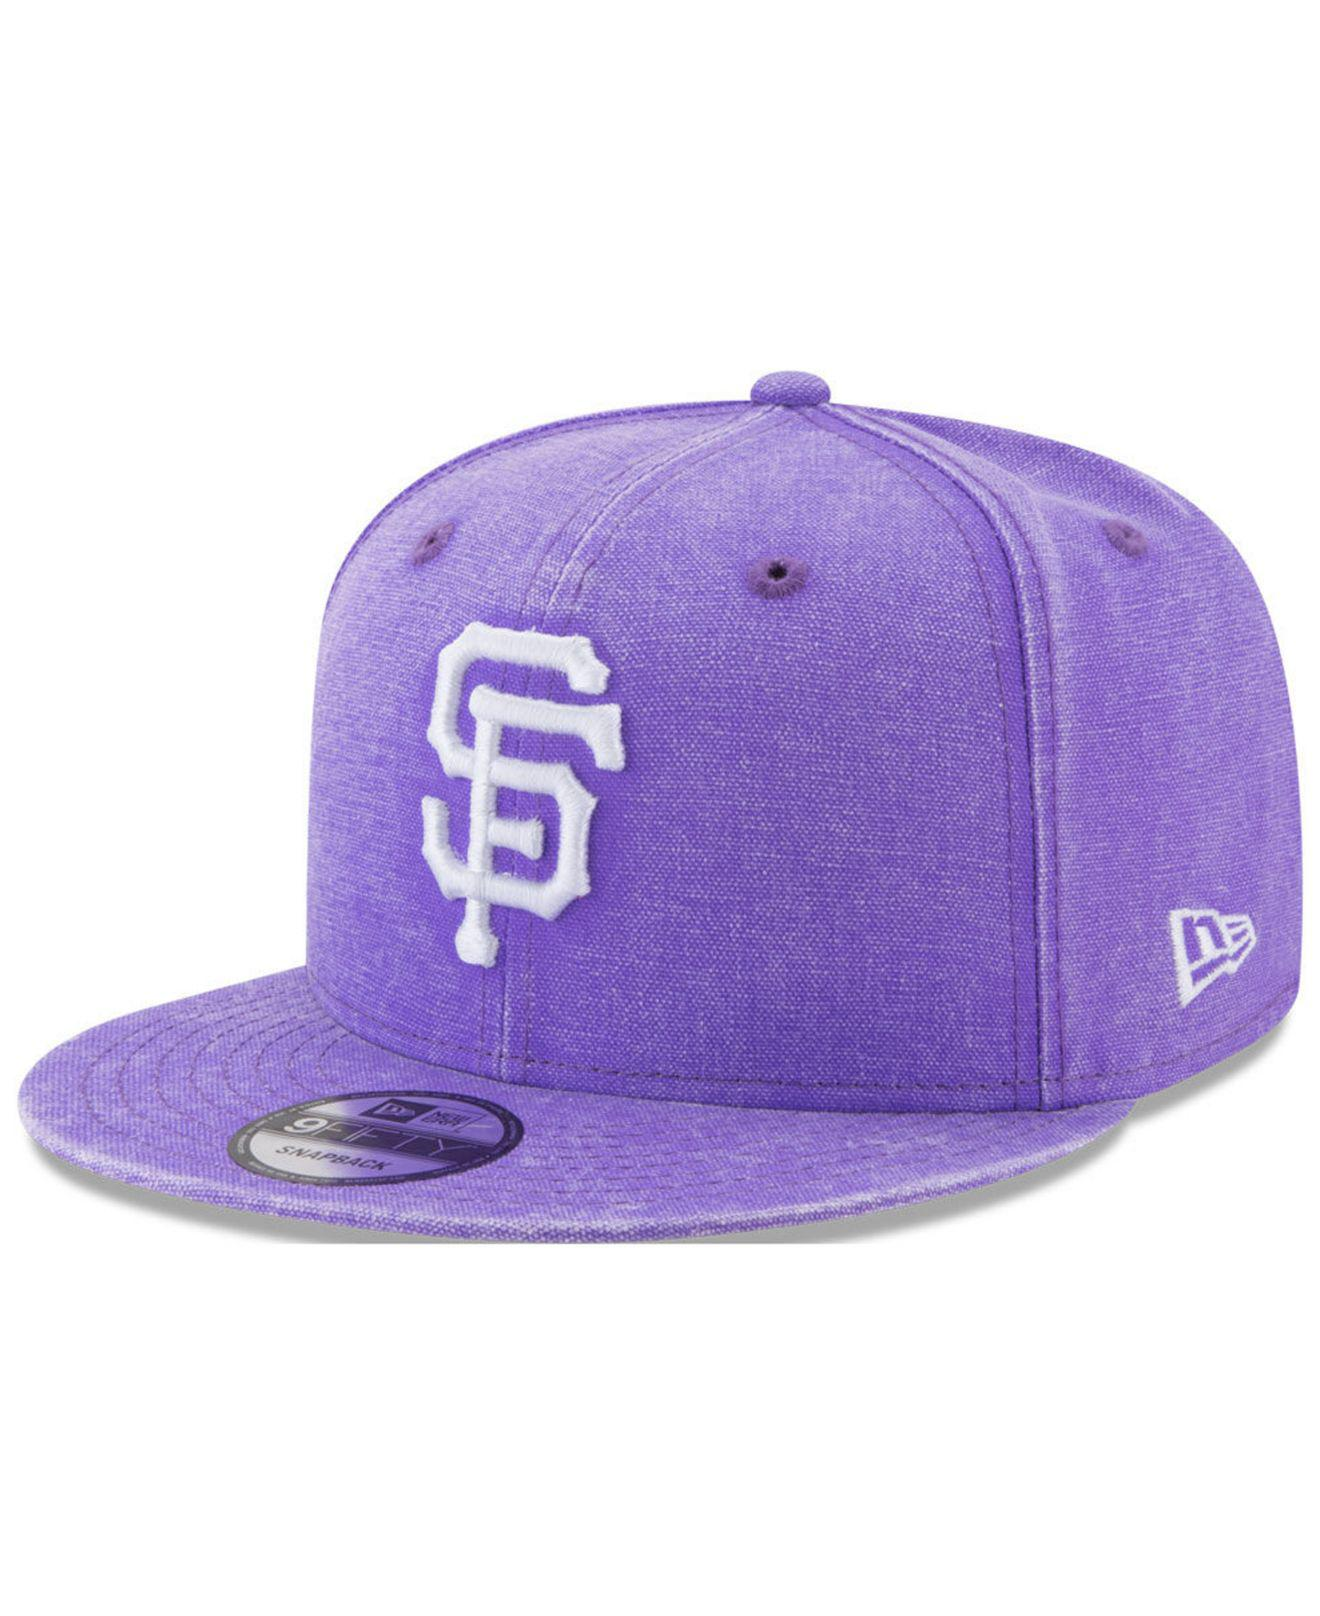 914523e9559 ... order ktz. mens purple san francisco giants neon time 9fifty snapback  cap 872af 7f4ae